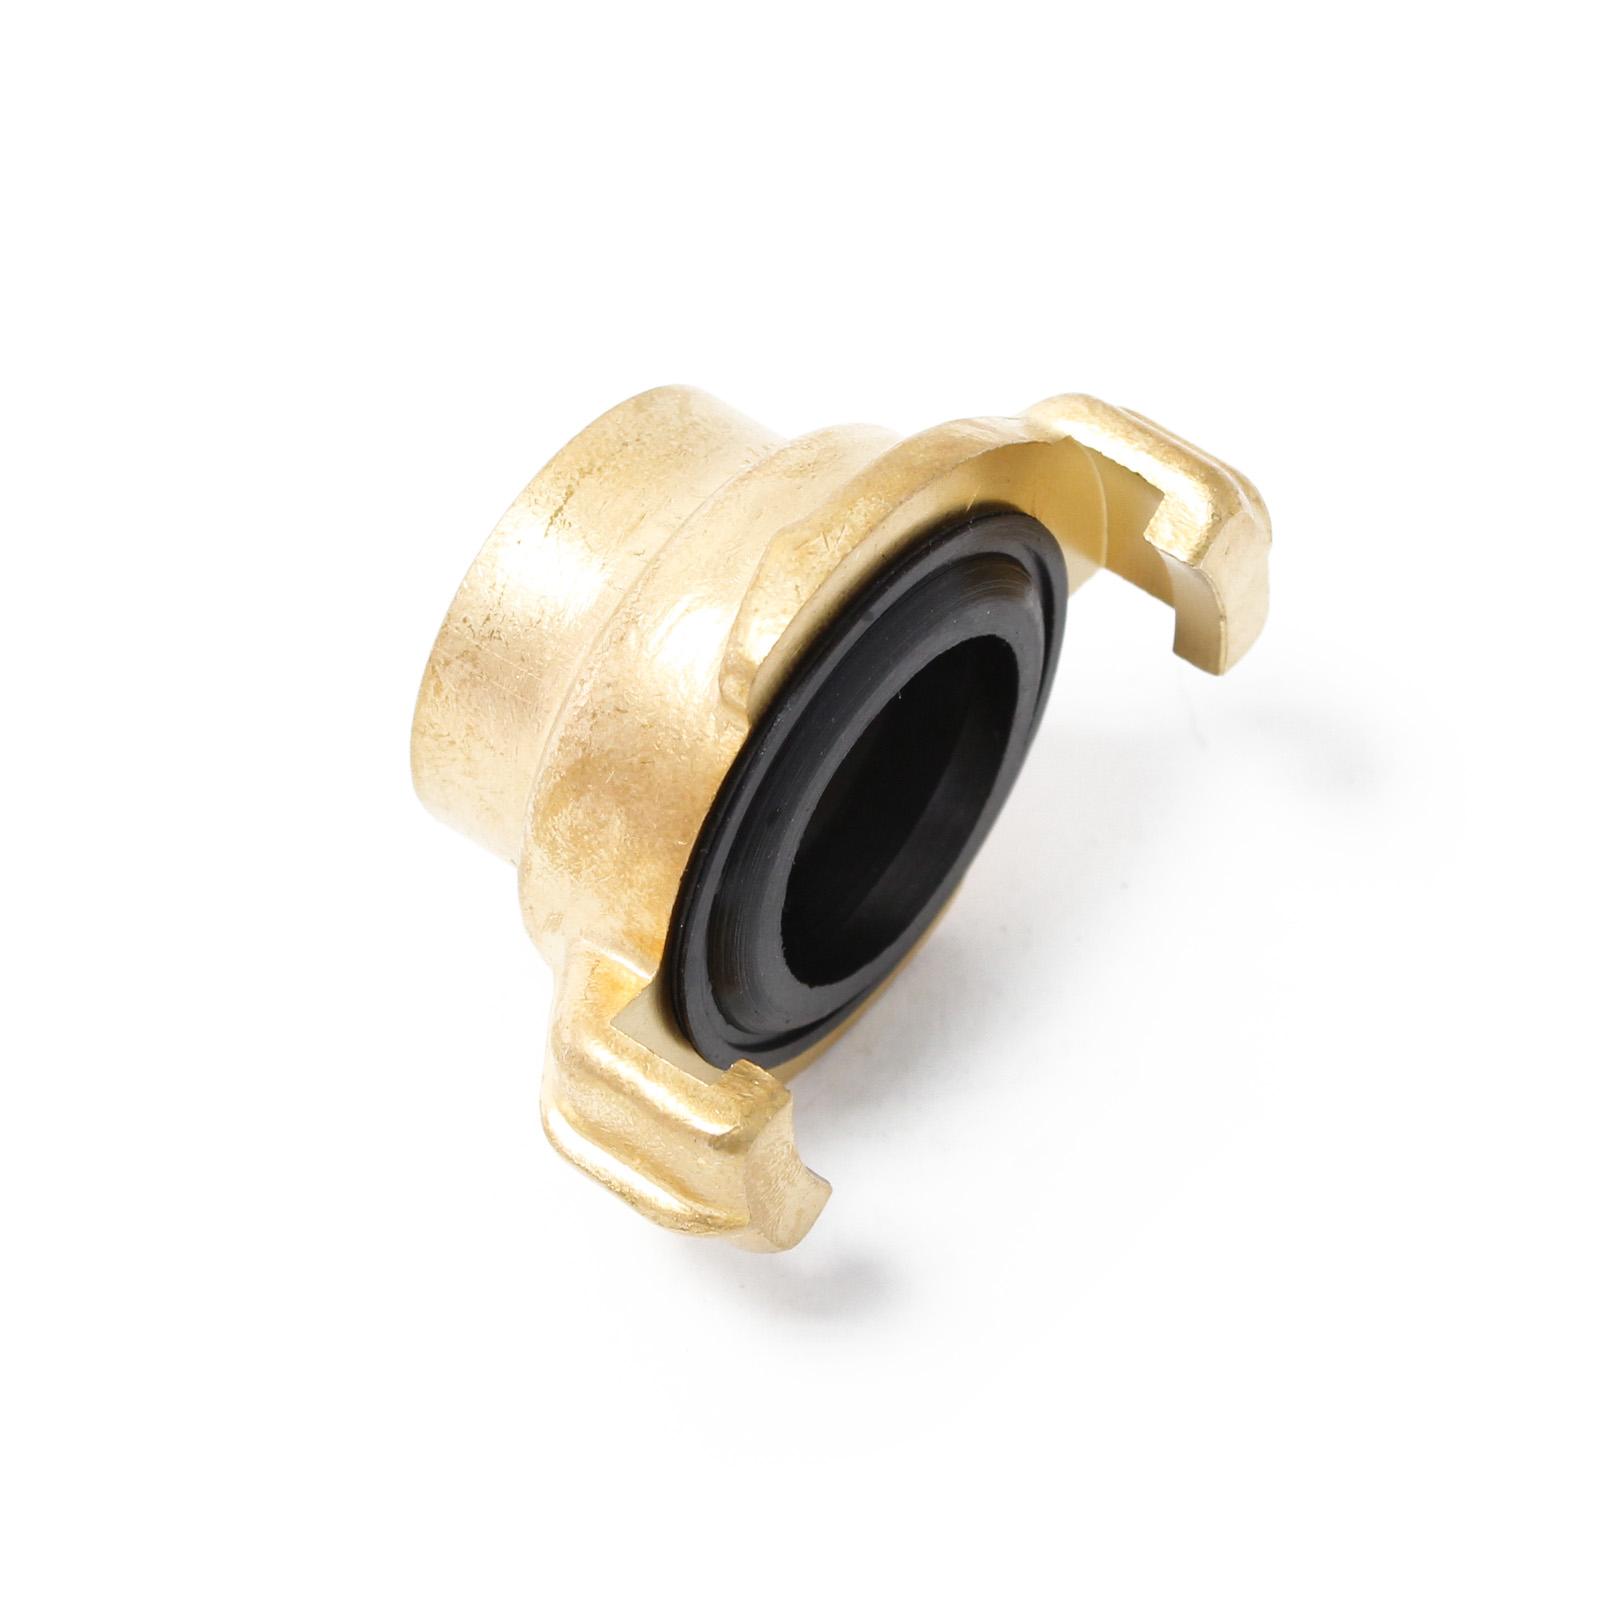 laiton raccord rapide tuyau d 39 eau dn20 3 4 filetage femelle ebay. Black Bedroom Furniture Sets. Home Design Ideas